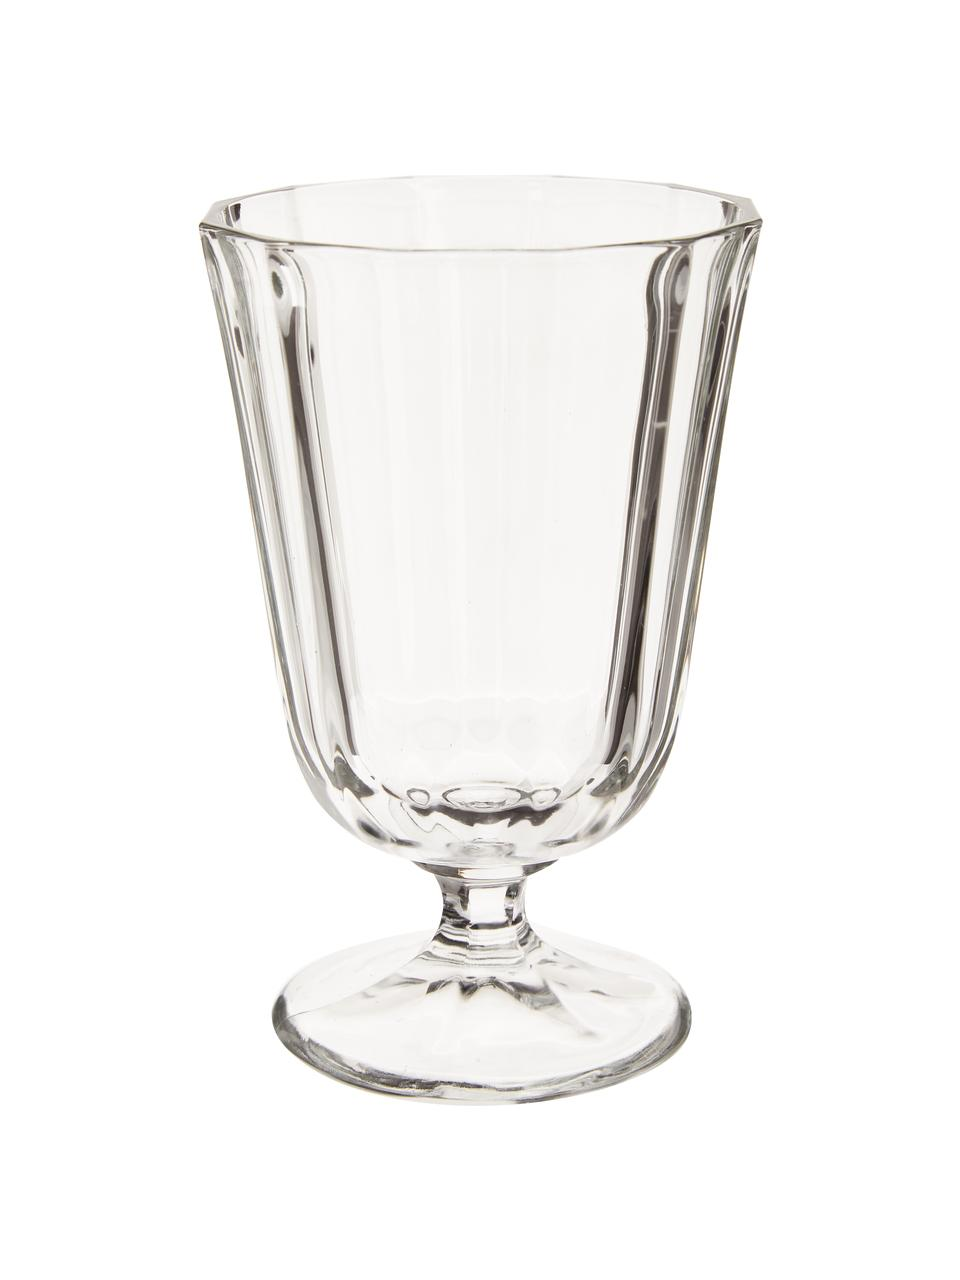 Bicchiere da vino country Ana 12 pz, Vetro, Trasparente, 195 ml